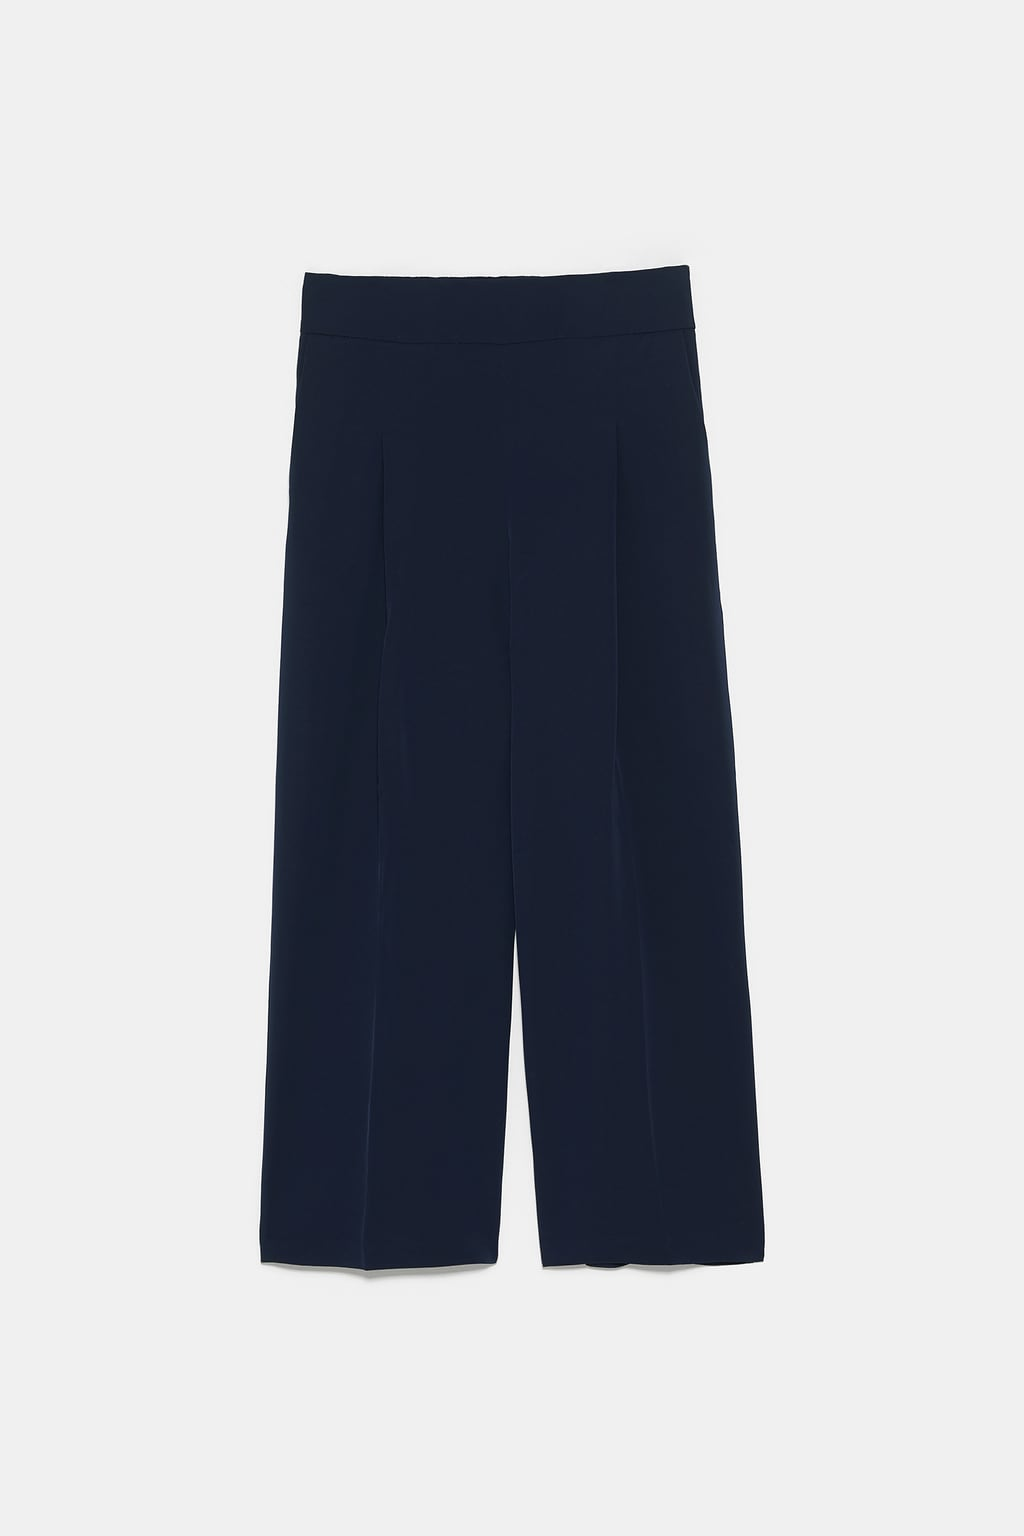 calça cintura alta zara